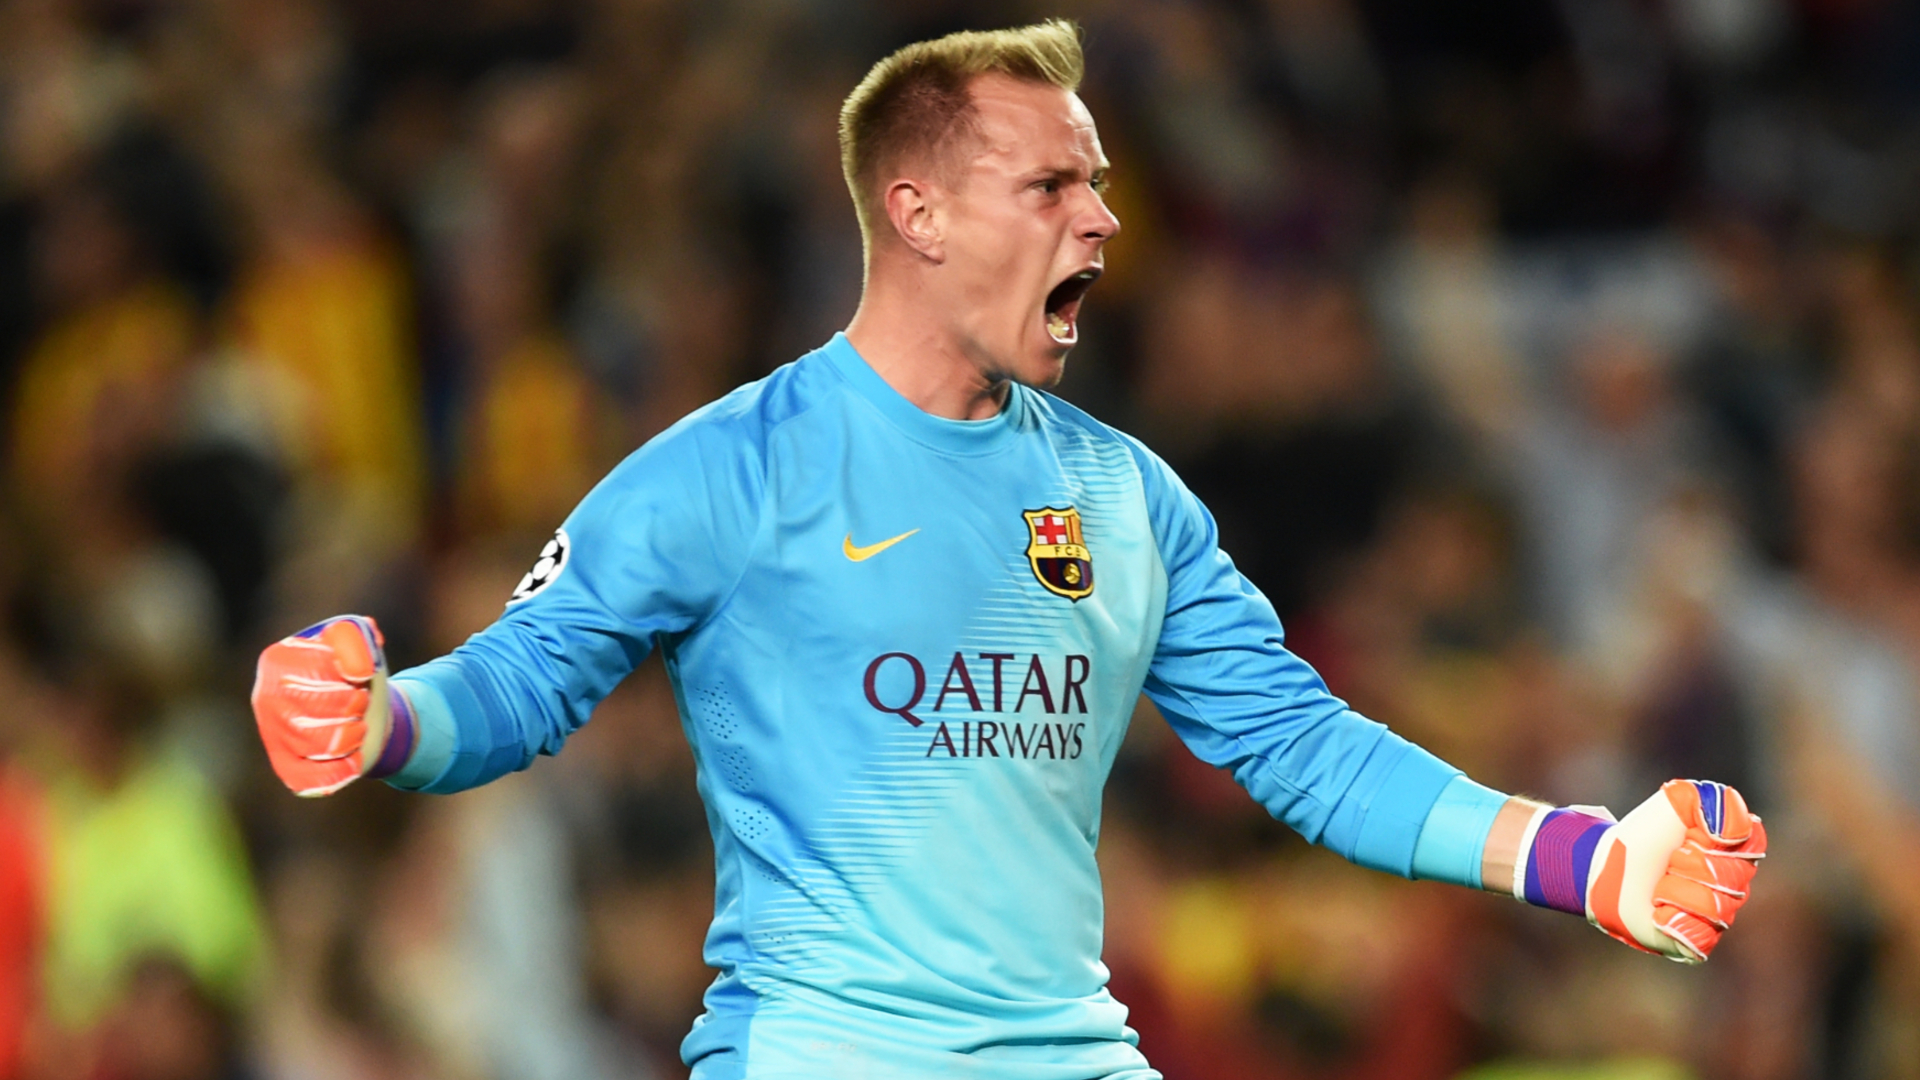 Ter Stegen desperate for more trophies after extending Barcelona contract